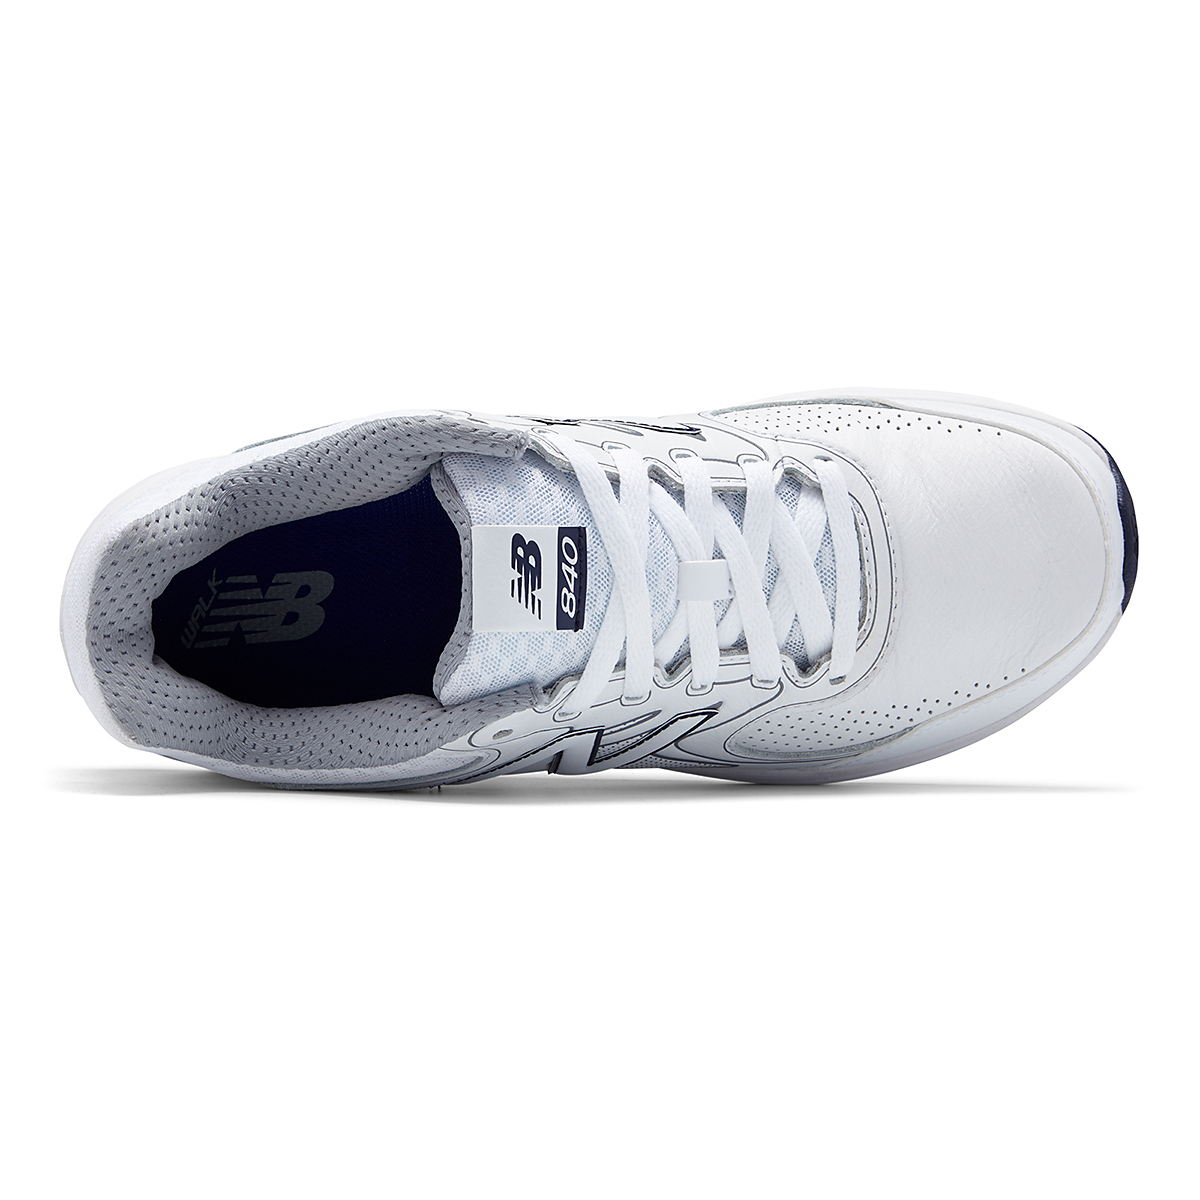 Men's New Balance 840v2 Leather Walking Shoe - Color: White/Navy - Size: 7 - Width: Wide, White/Navy, large, image 3